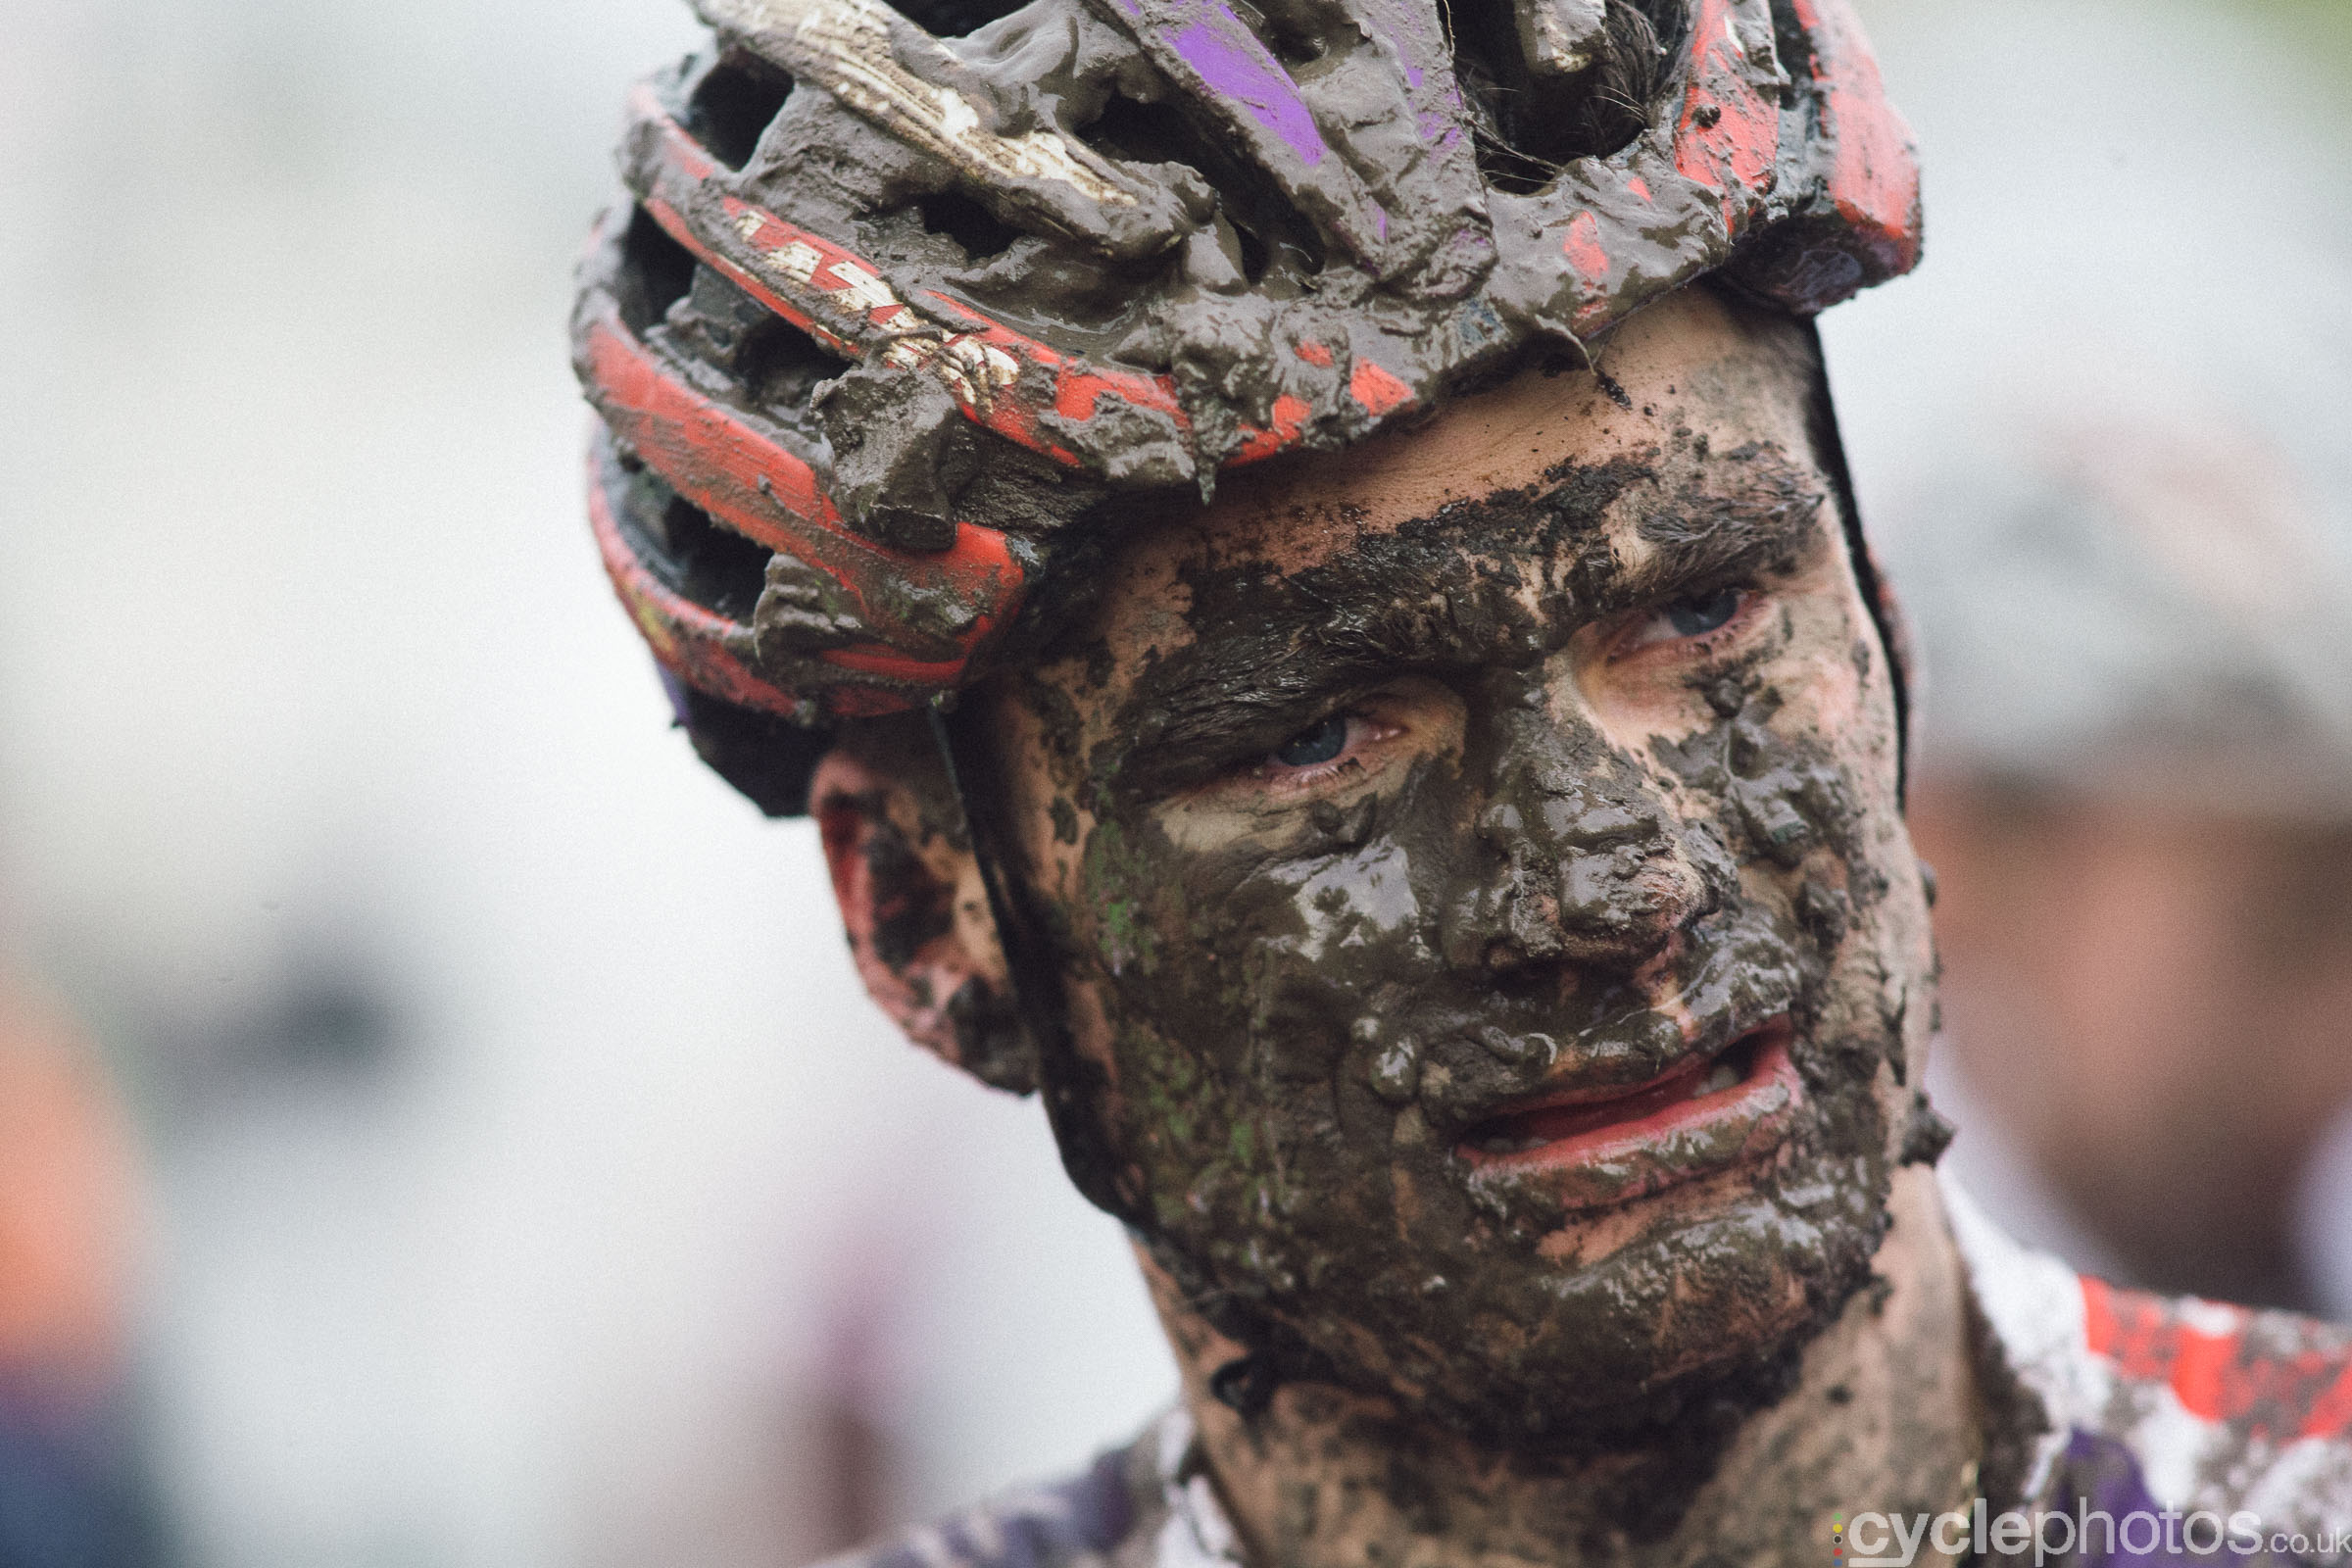 David van der Poel at Cyclocross Superprestige #5 - Gavere, BEL